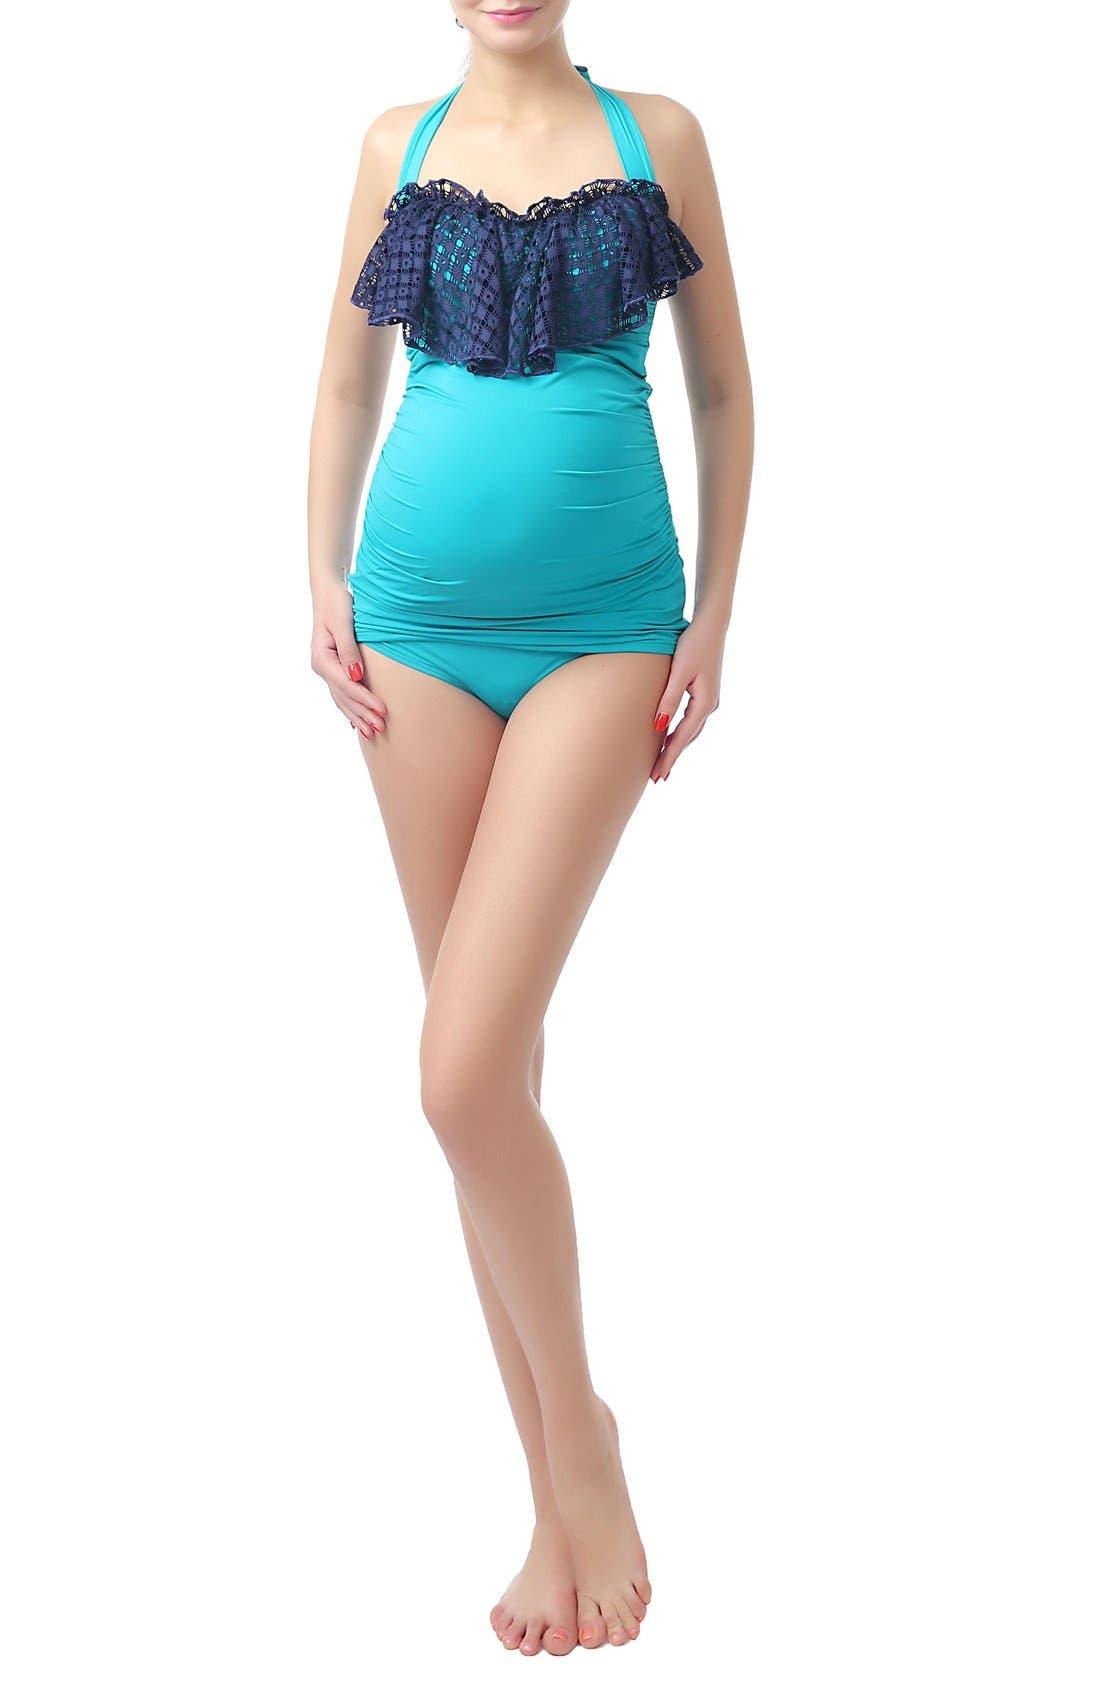 Kimi and Kai 'Ruby Crochet' Maternity Two-Piece Tankini Swimsuit